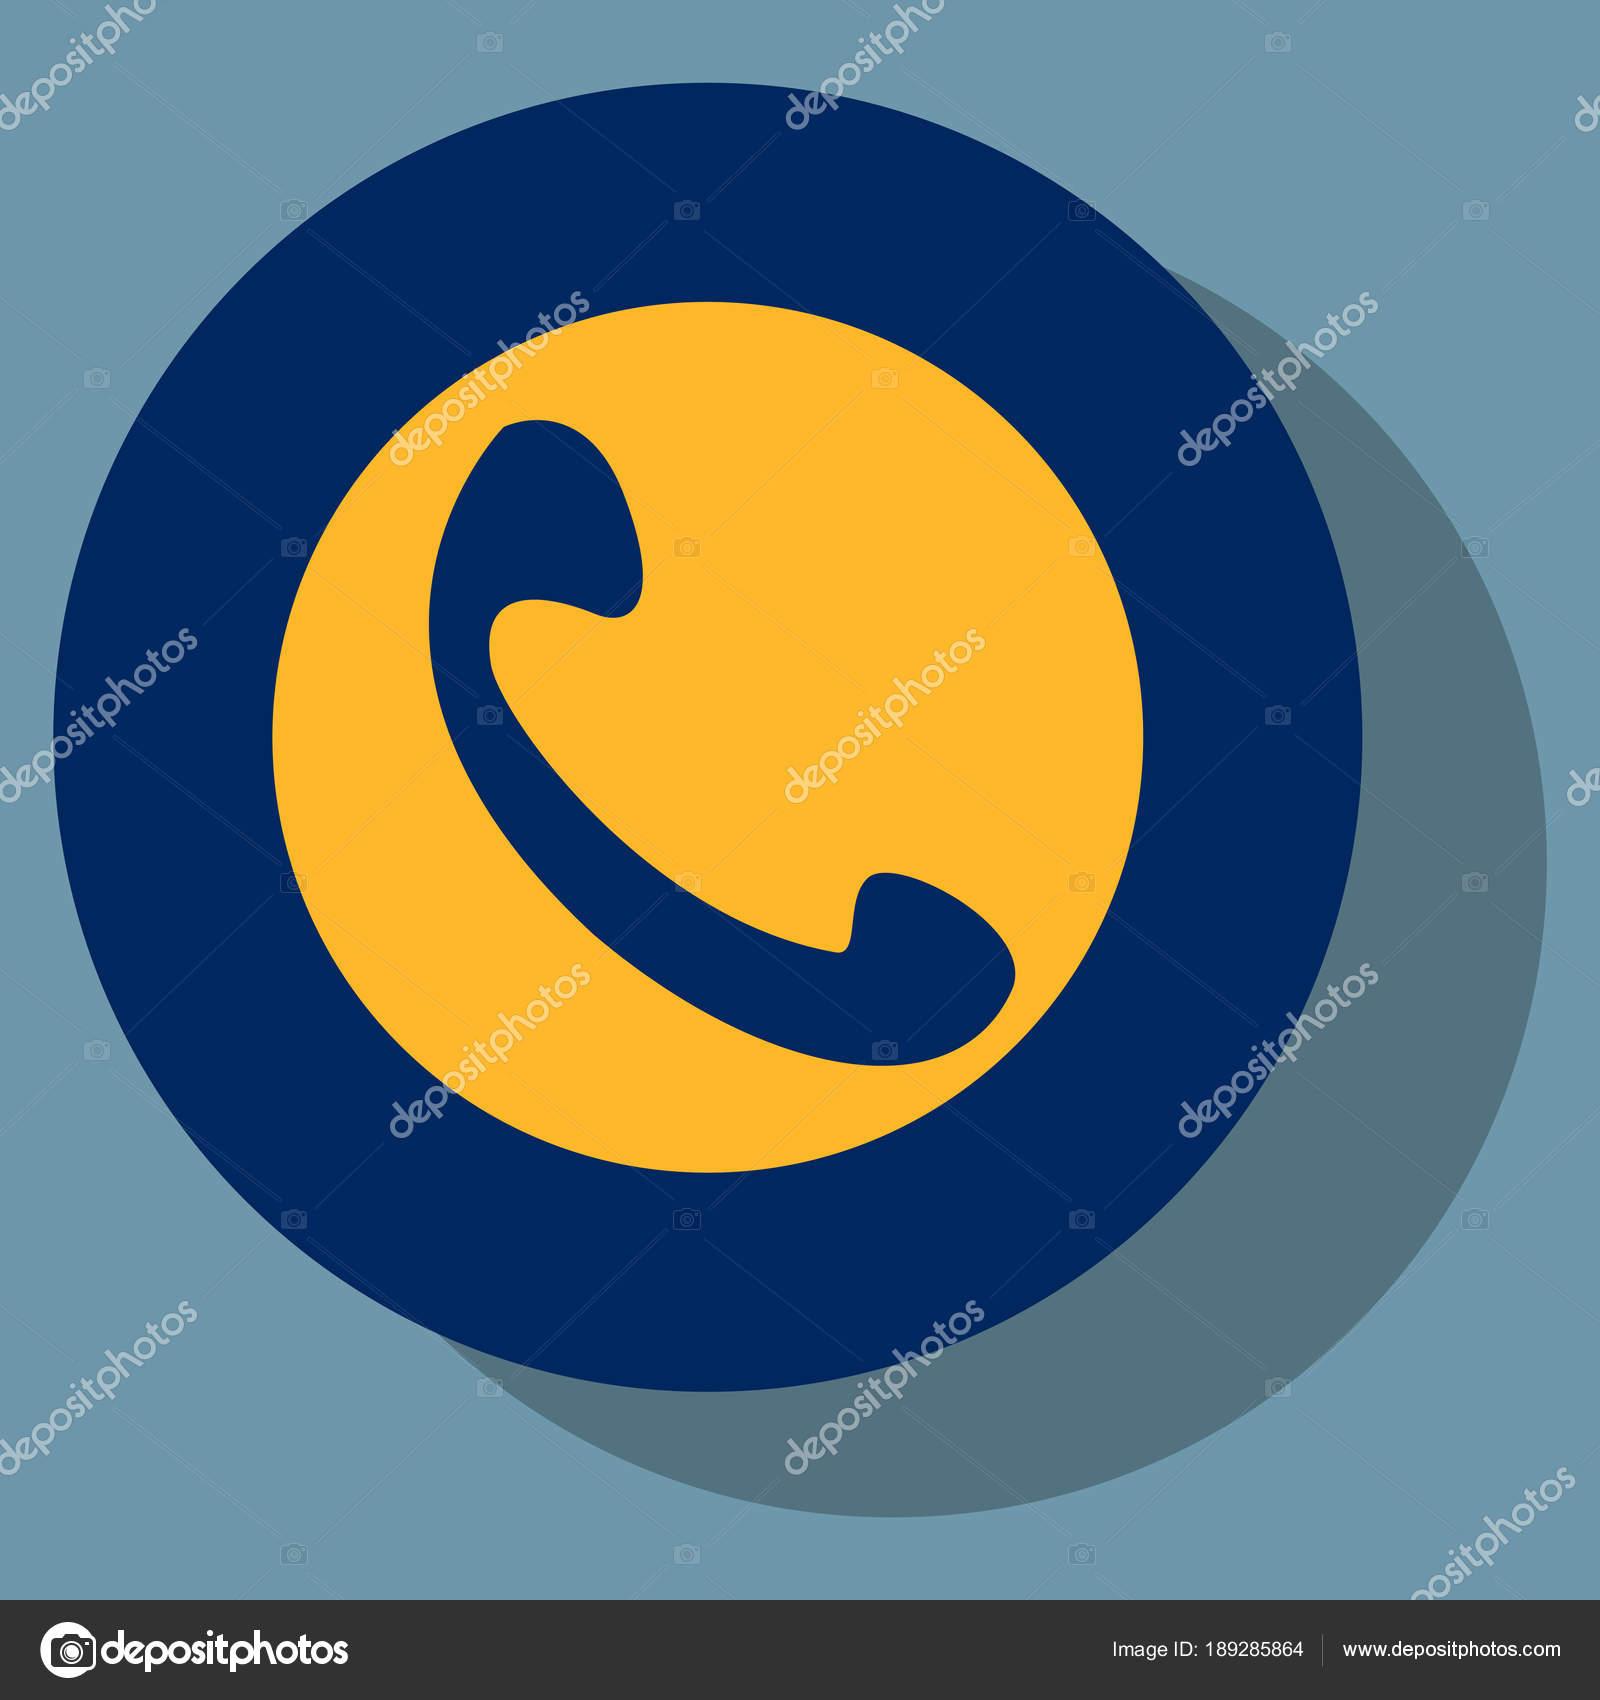 Viber Flat Icon Vector Illustration Element Template For Design